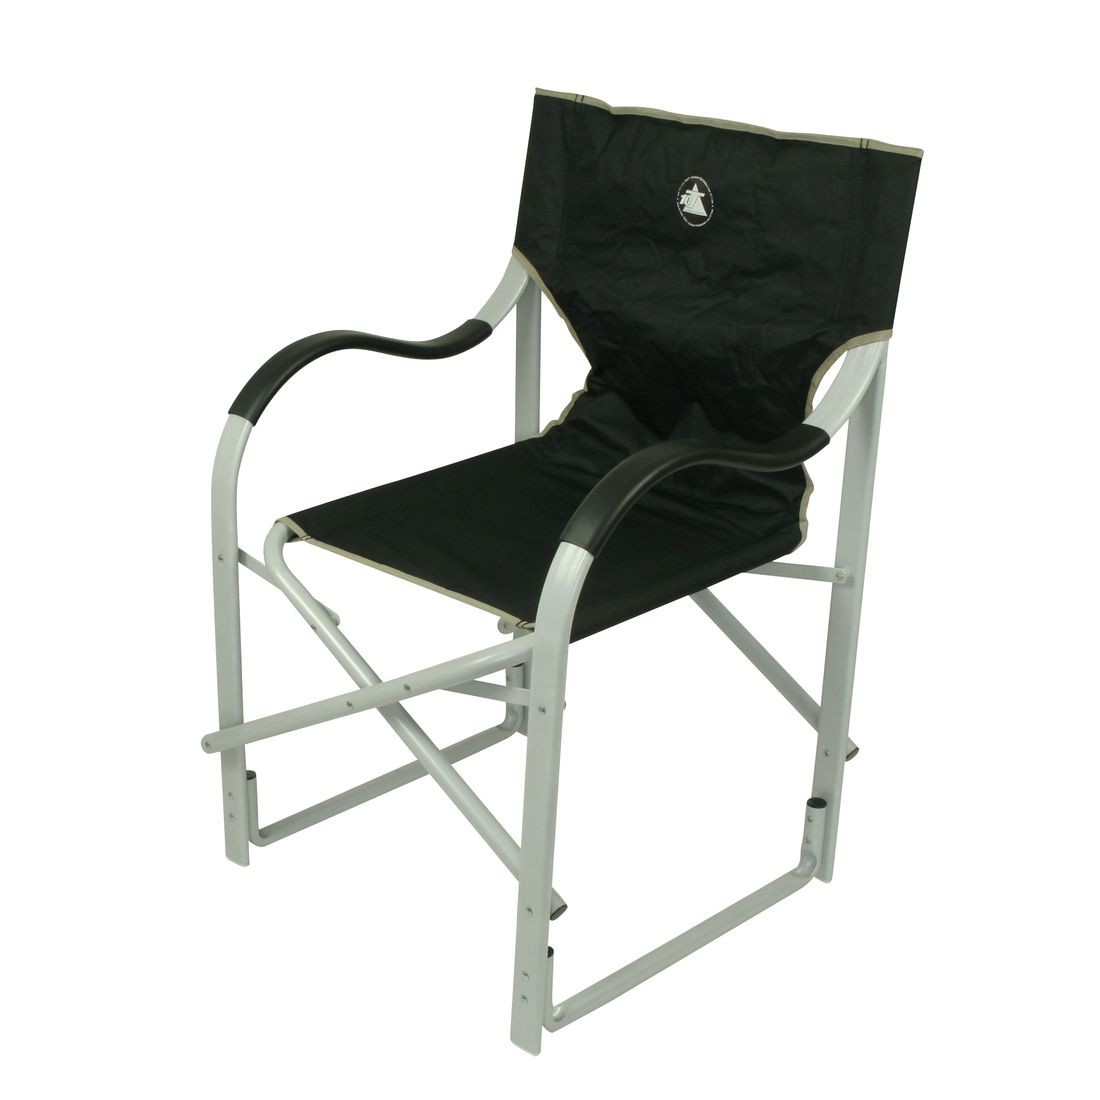 grand canyon alu 3 bein hocker aluminium faltbar grau 308017 deepblue. Black Bedroom Furniture Sets. Home Design Ideas